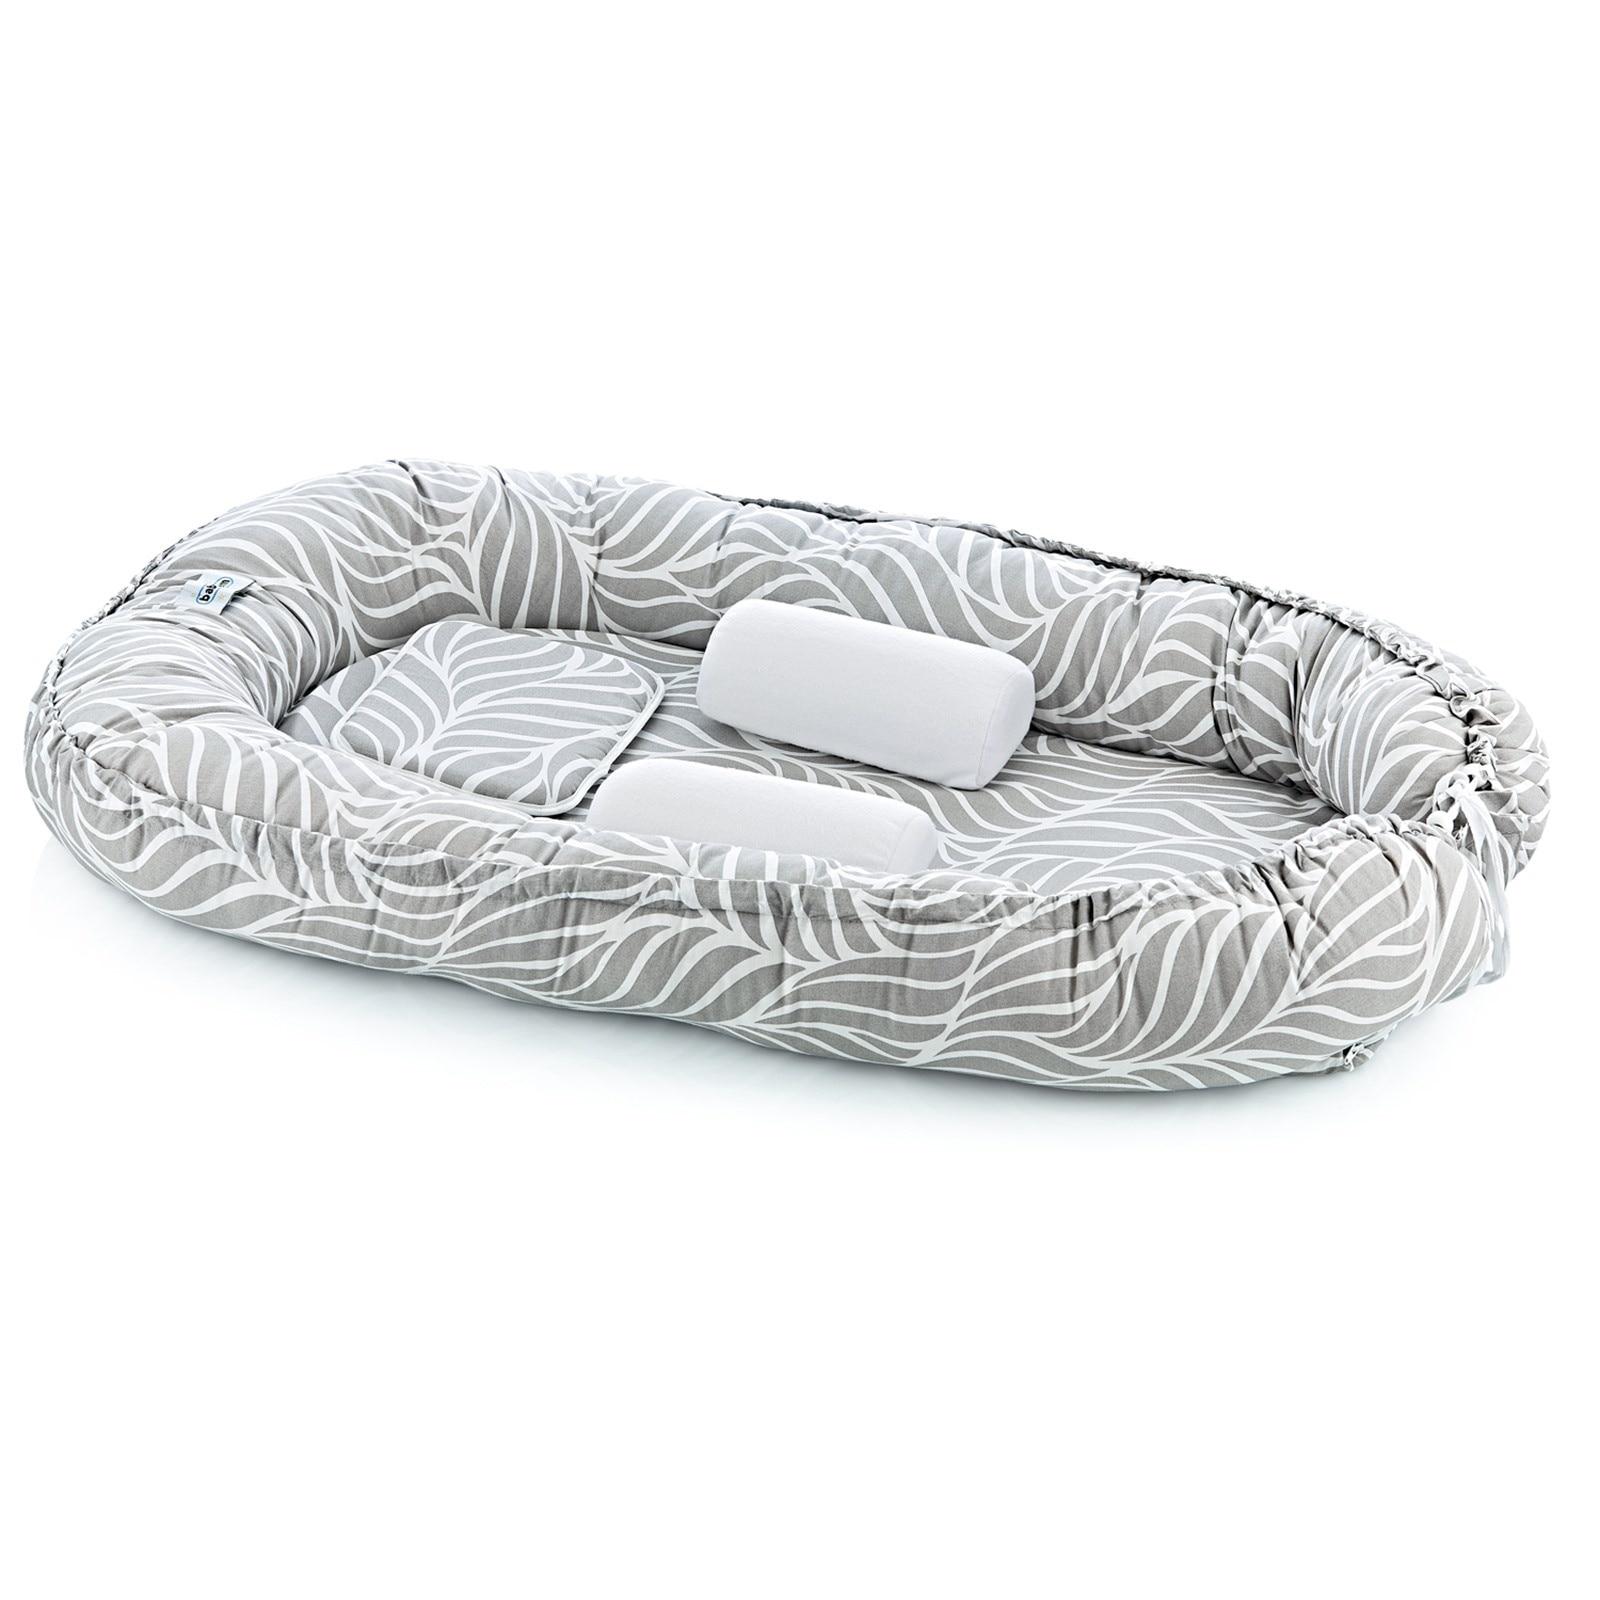 Ebebek Babyjem Mom & Dad Side Baby Bed Gray